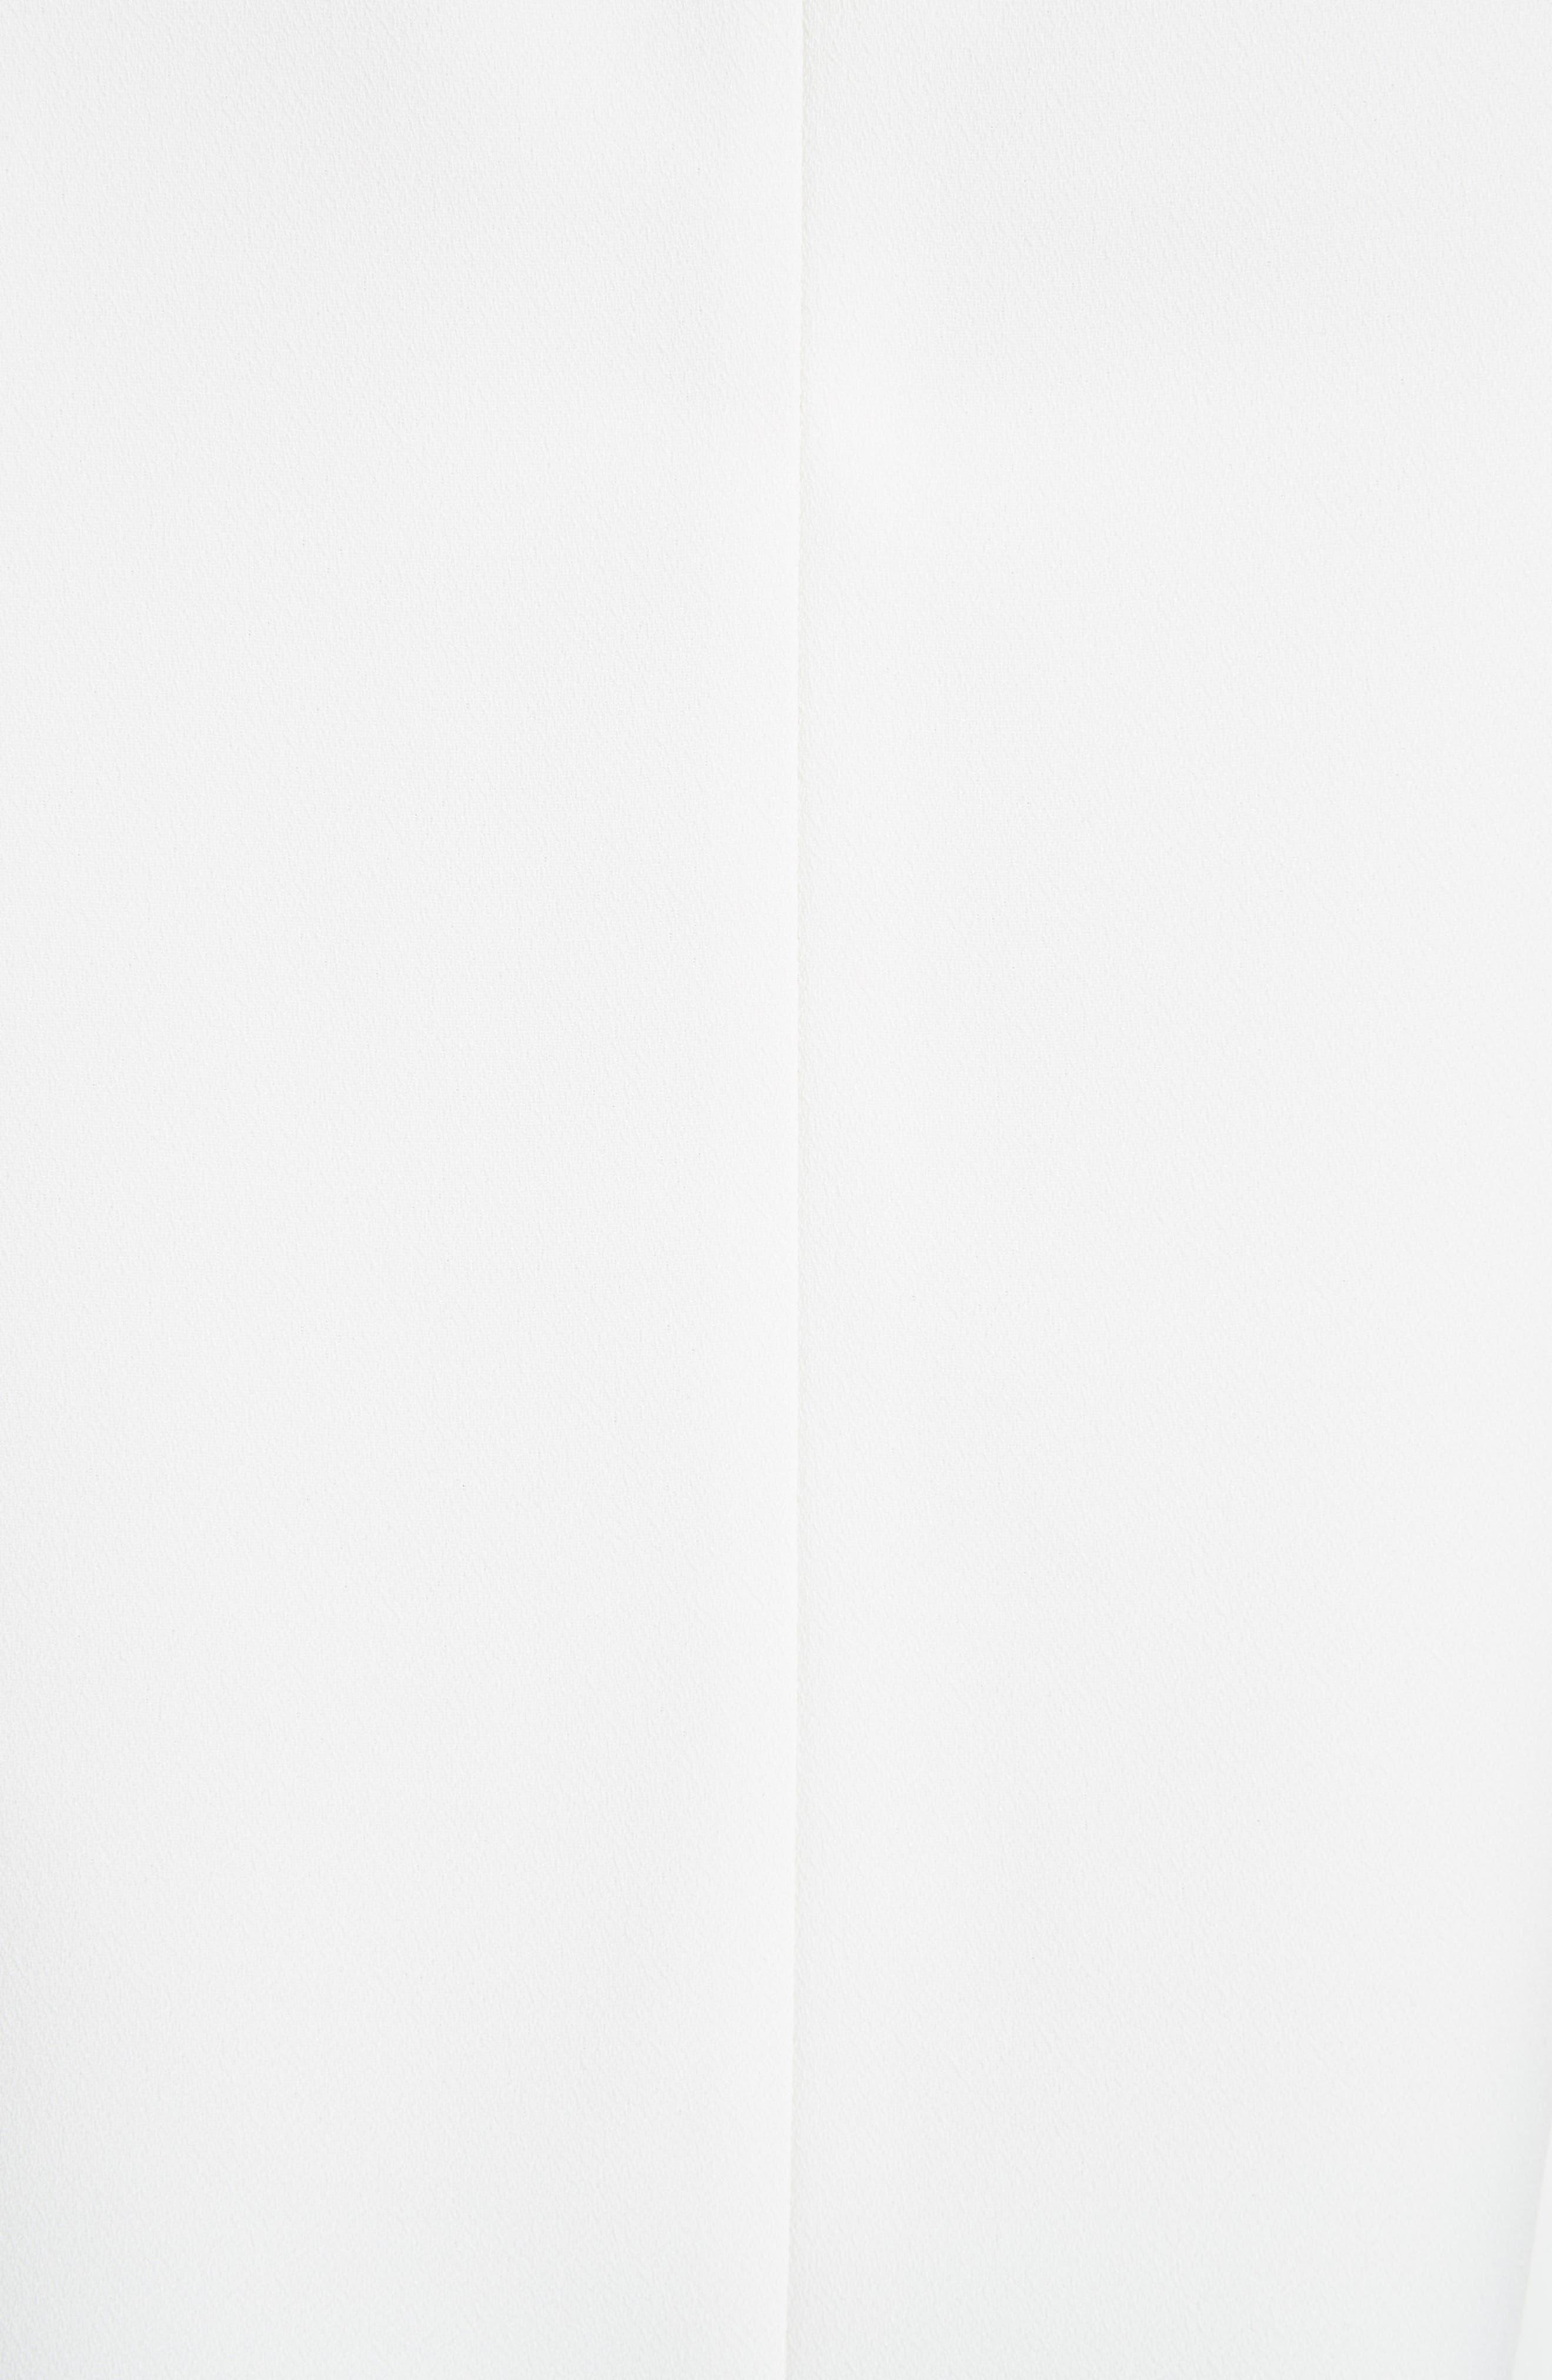 TED BAKER LONDON, Kelliss Sculpted Bow Sleeveless Top, Alternate thumbnail 5, color, 905